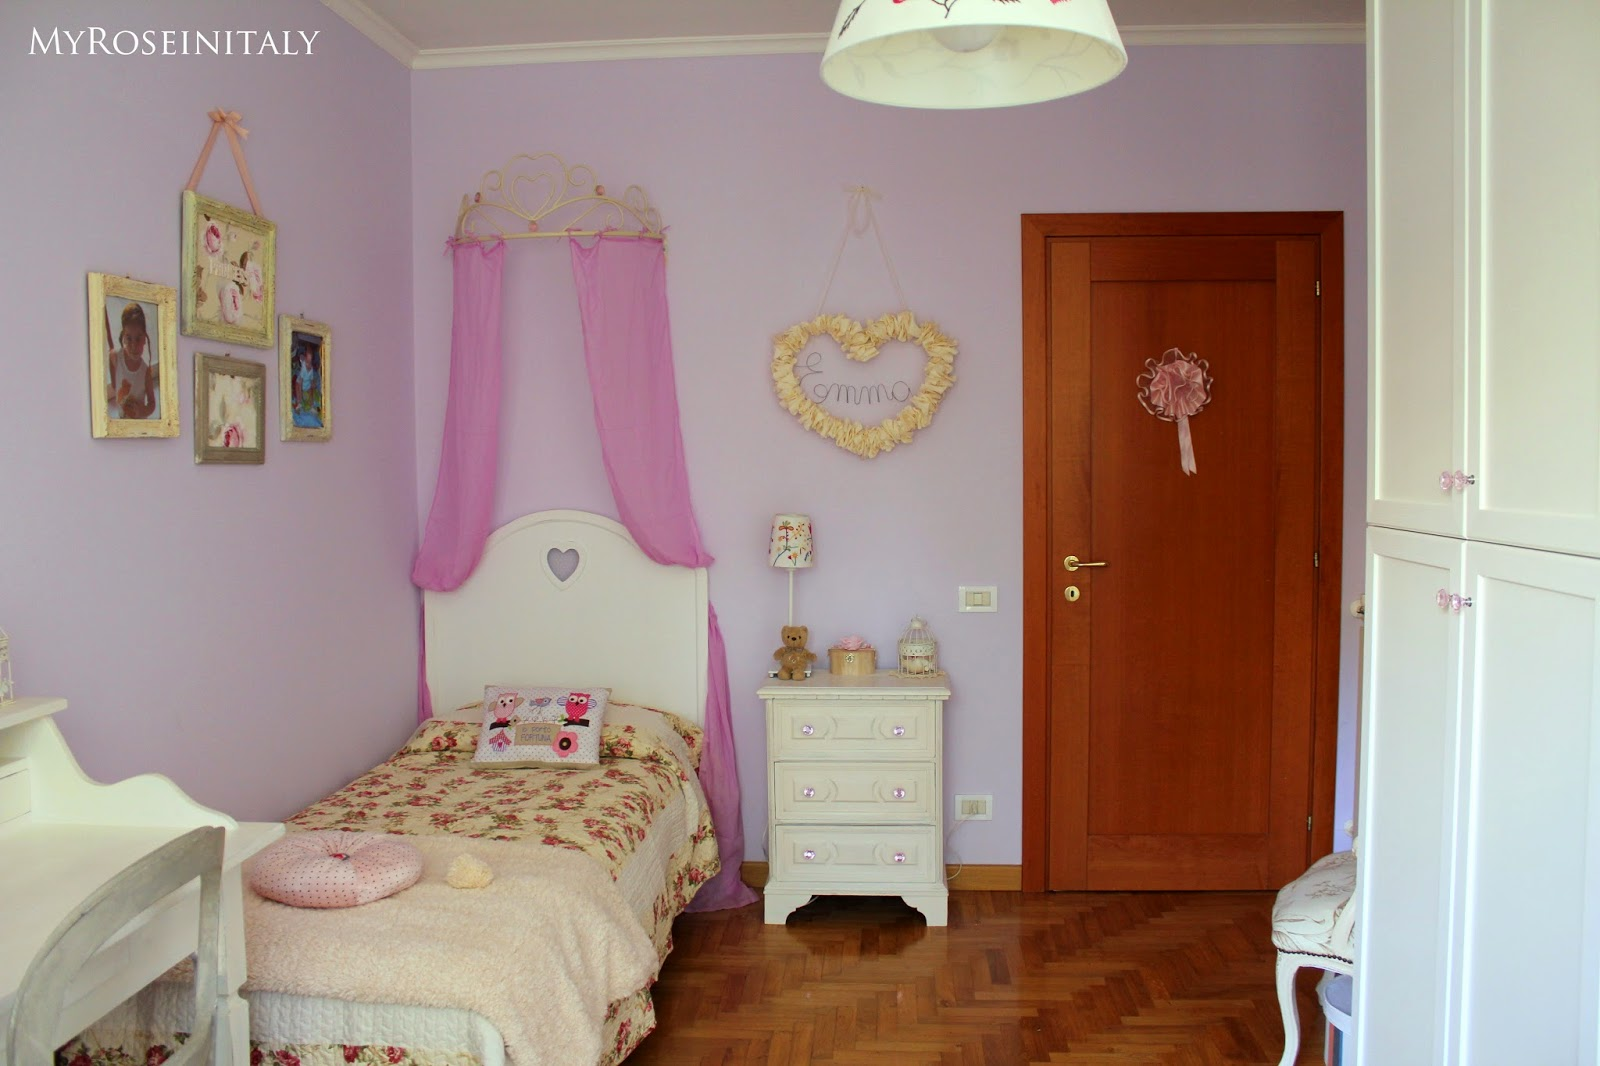 Colori pareti camerette per ragazze - Pareti dipinte per camerette ...